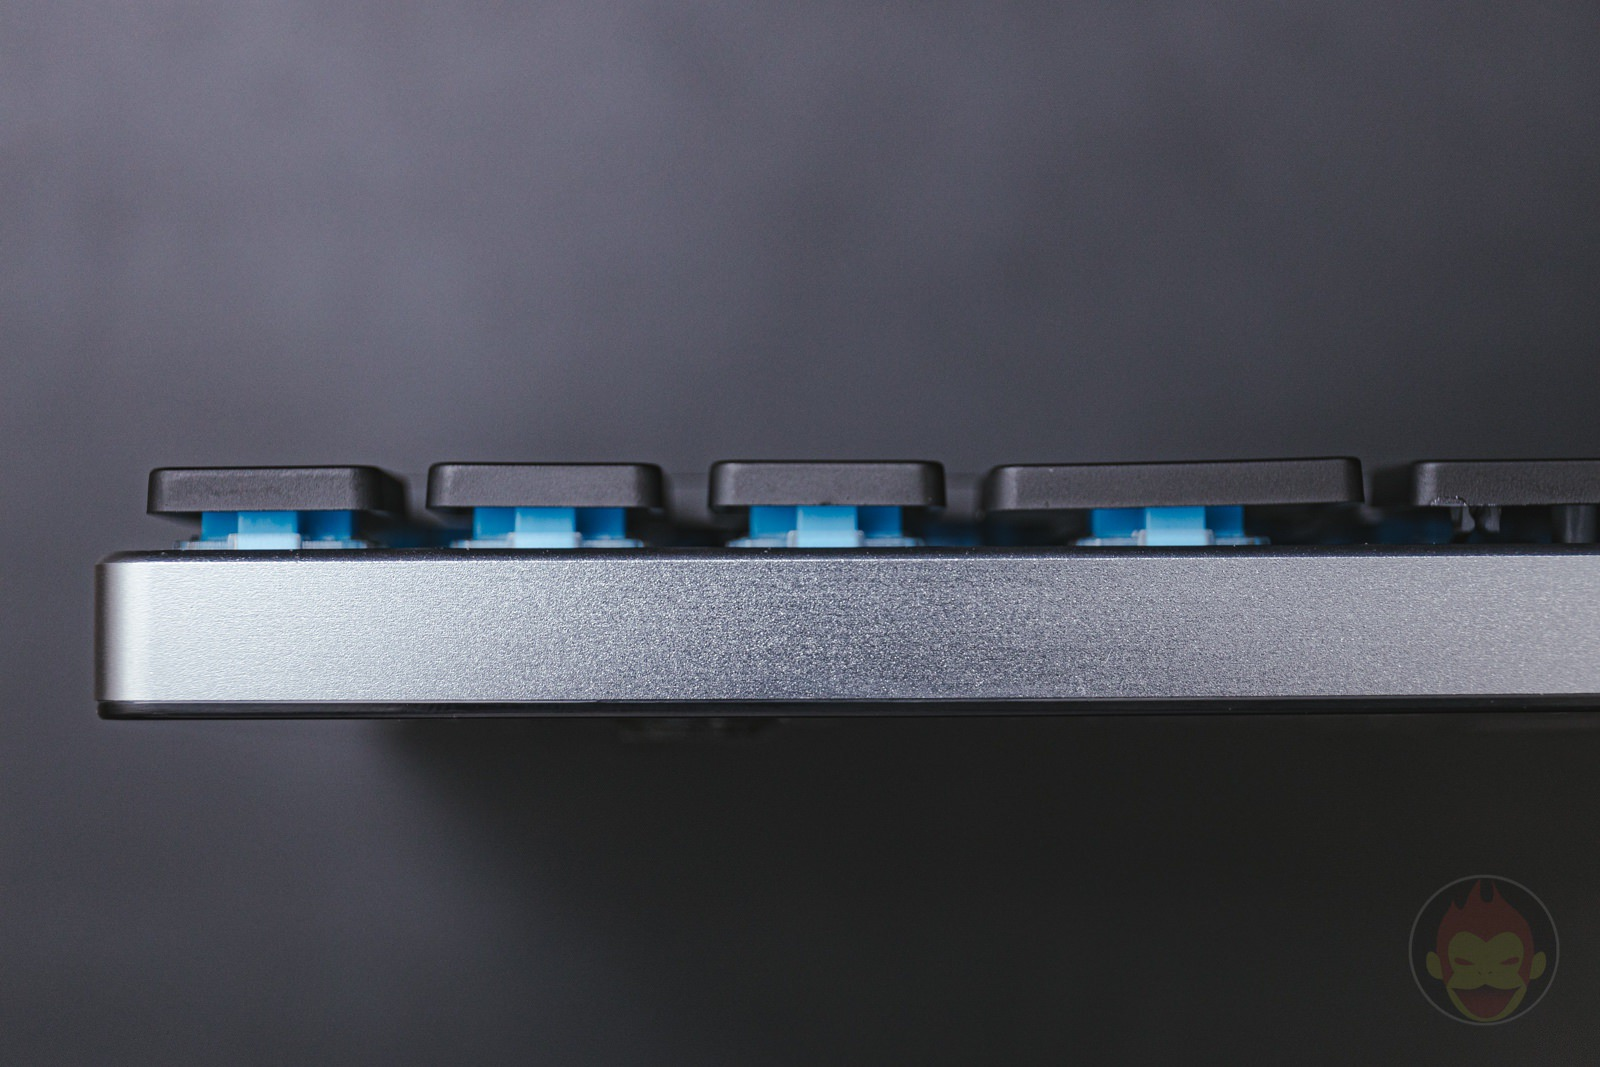 Vinpok-Taptek-Wireless-Keyboard-Review-2-10.jpg